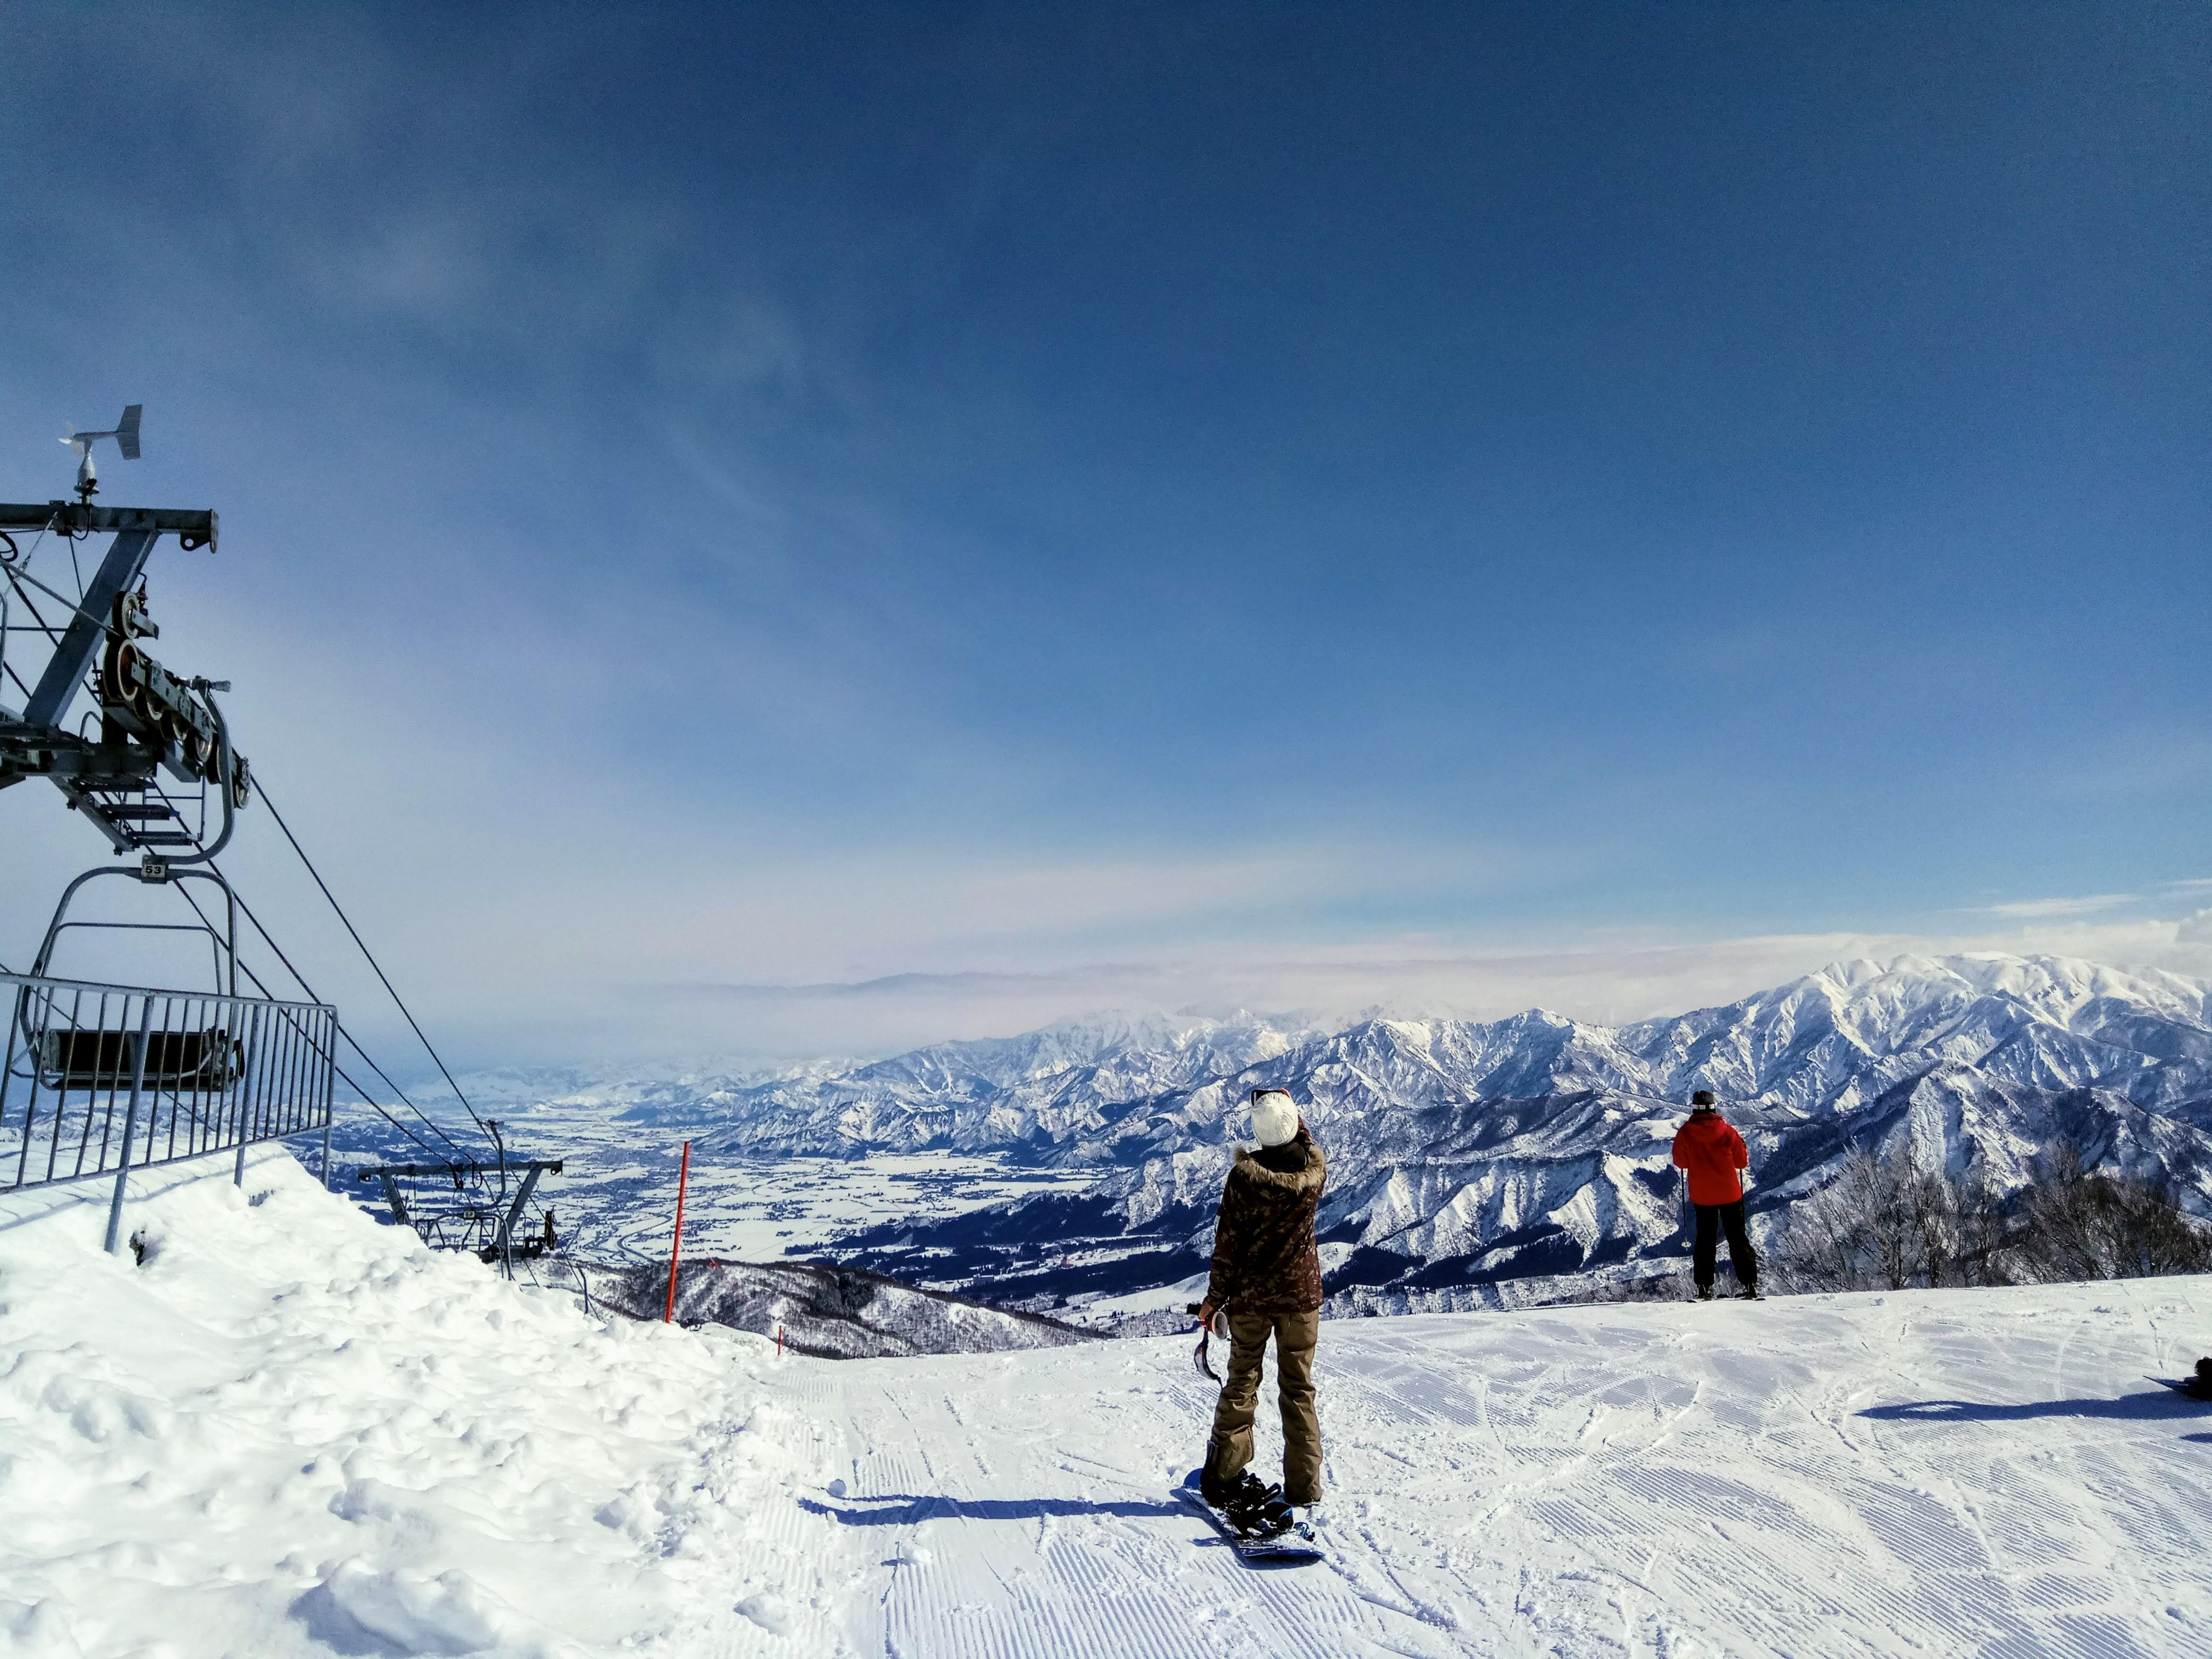 gala yuzawa: easy ski and snowboarding day trip from tokyo | tokyo